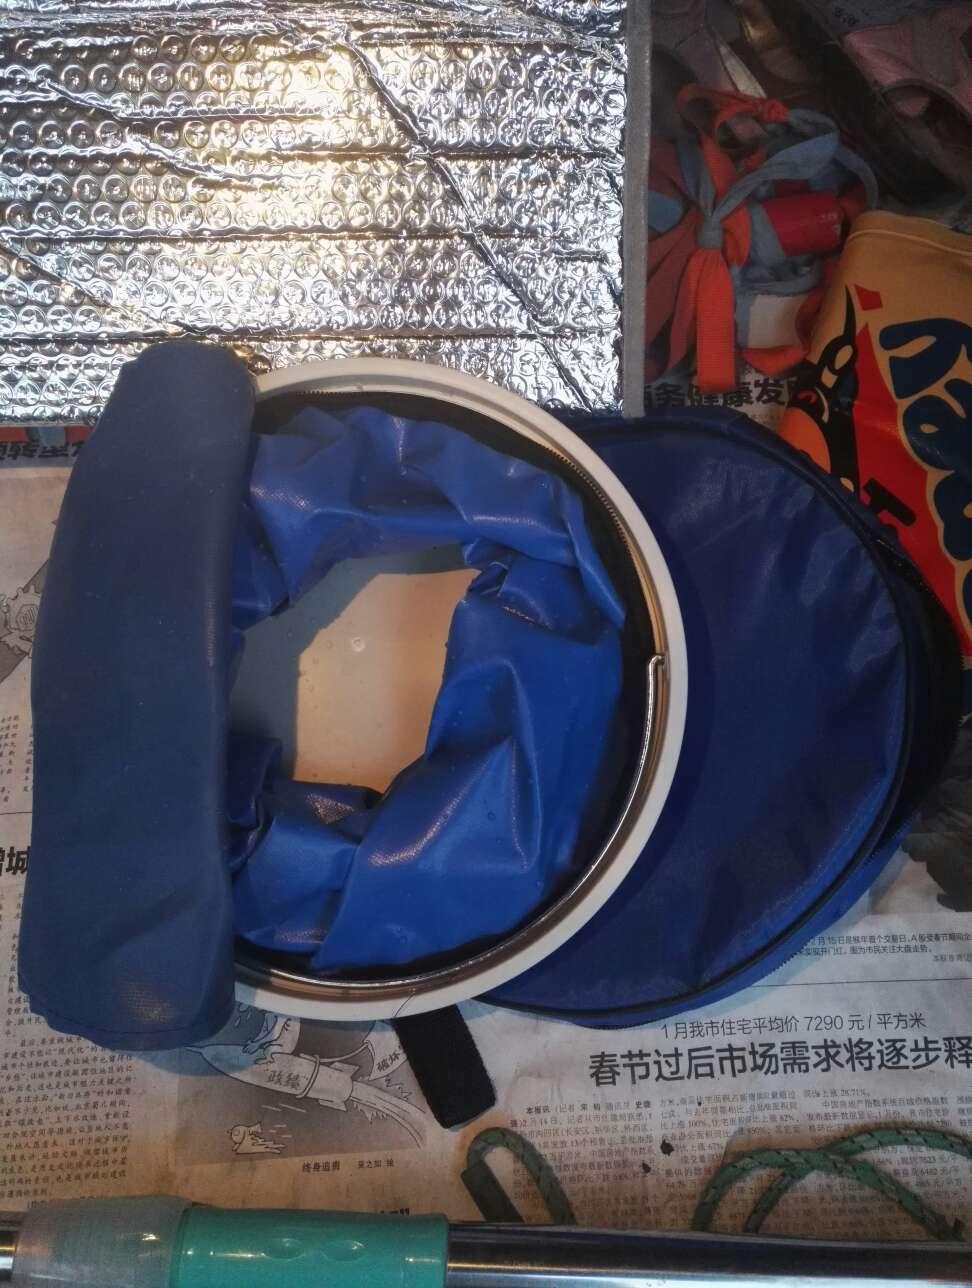 compression sports bra sale 00228389 onlineshop